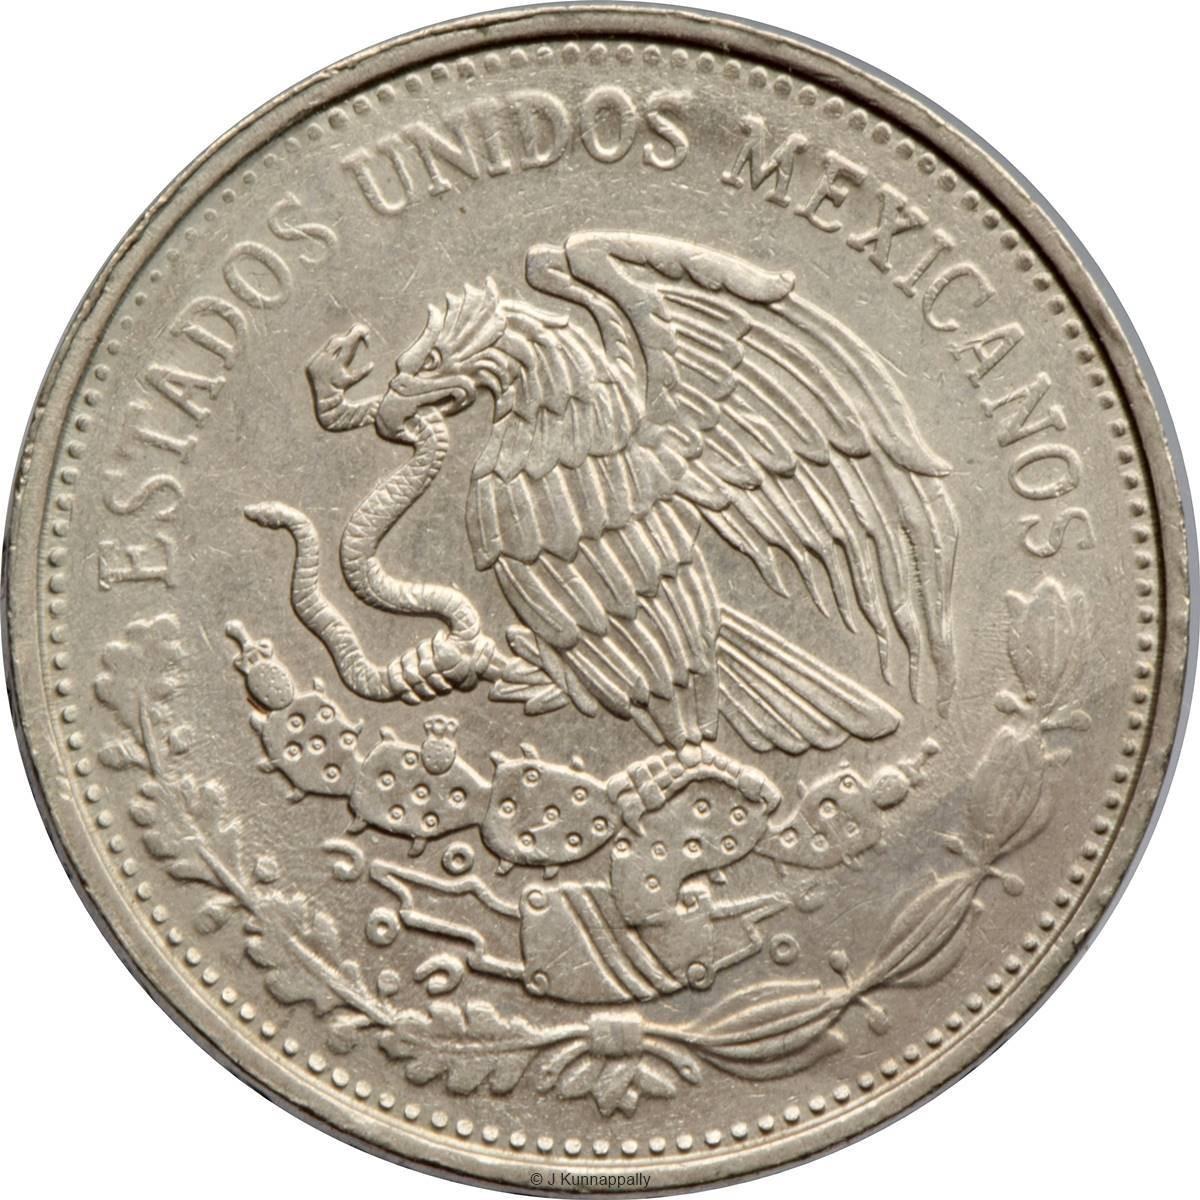 Mexico 20 Pesos (1980-1984)